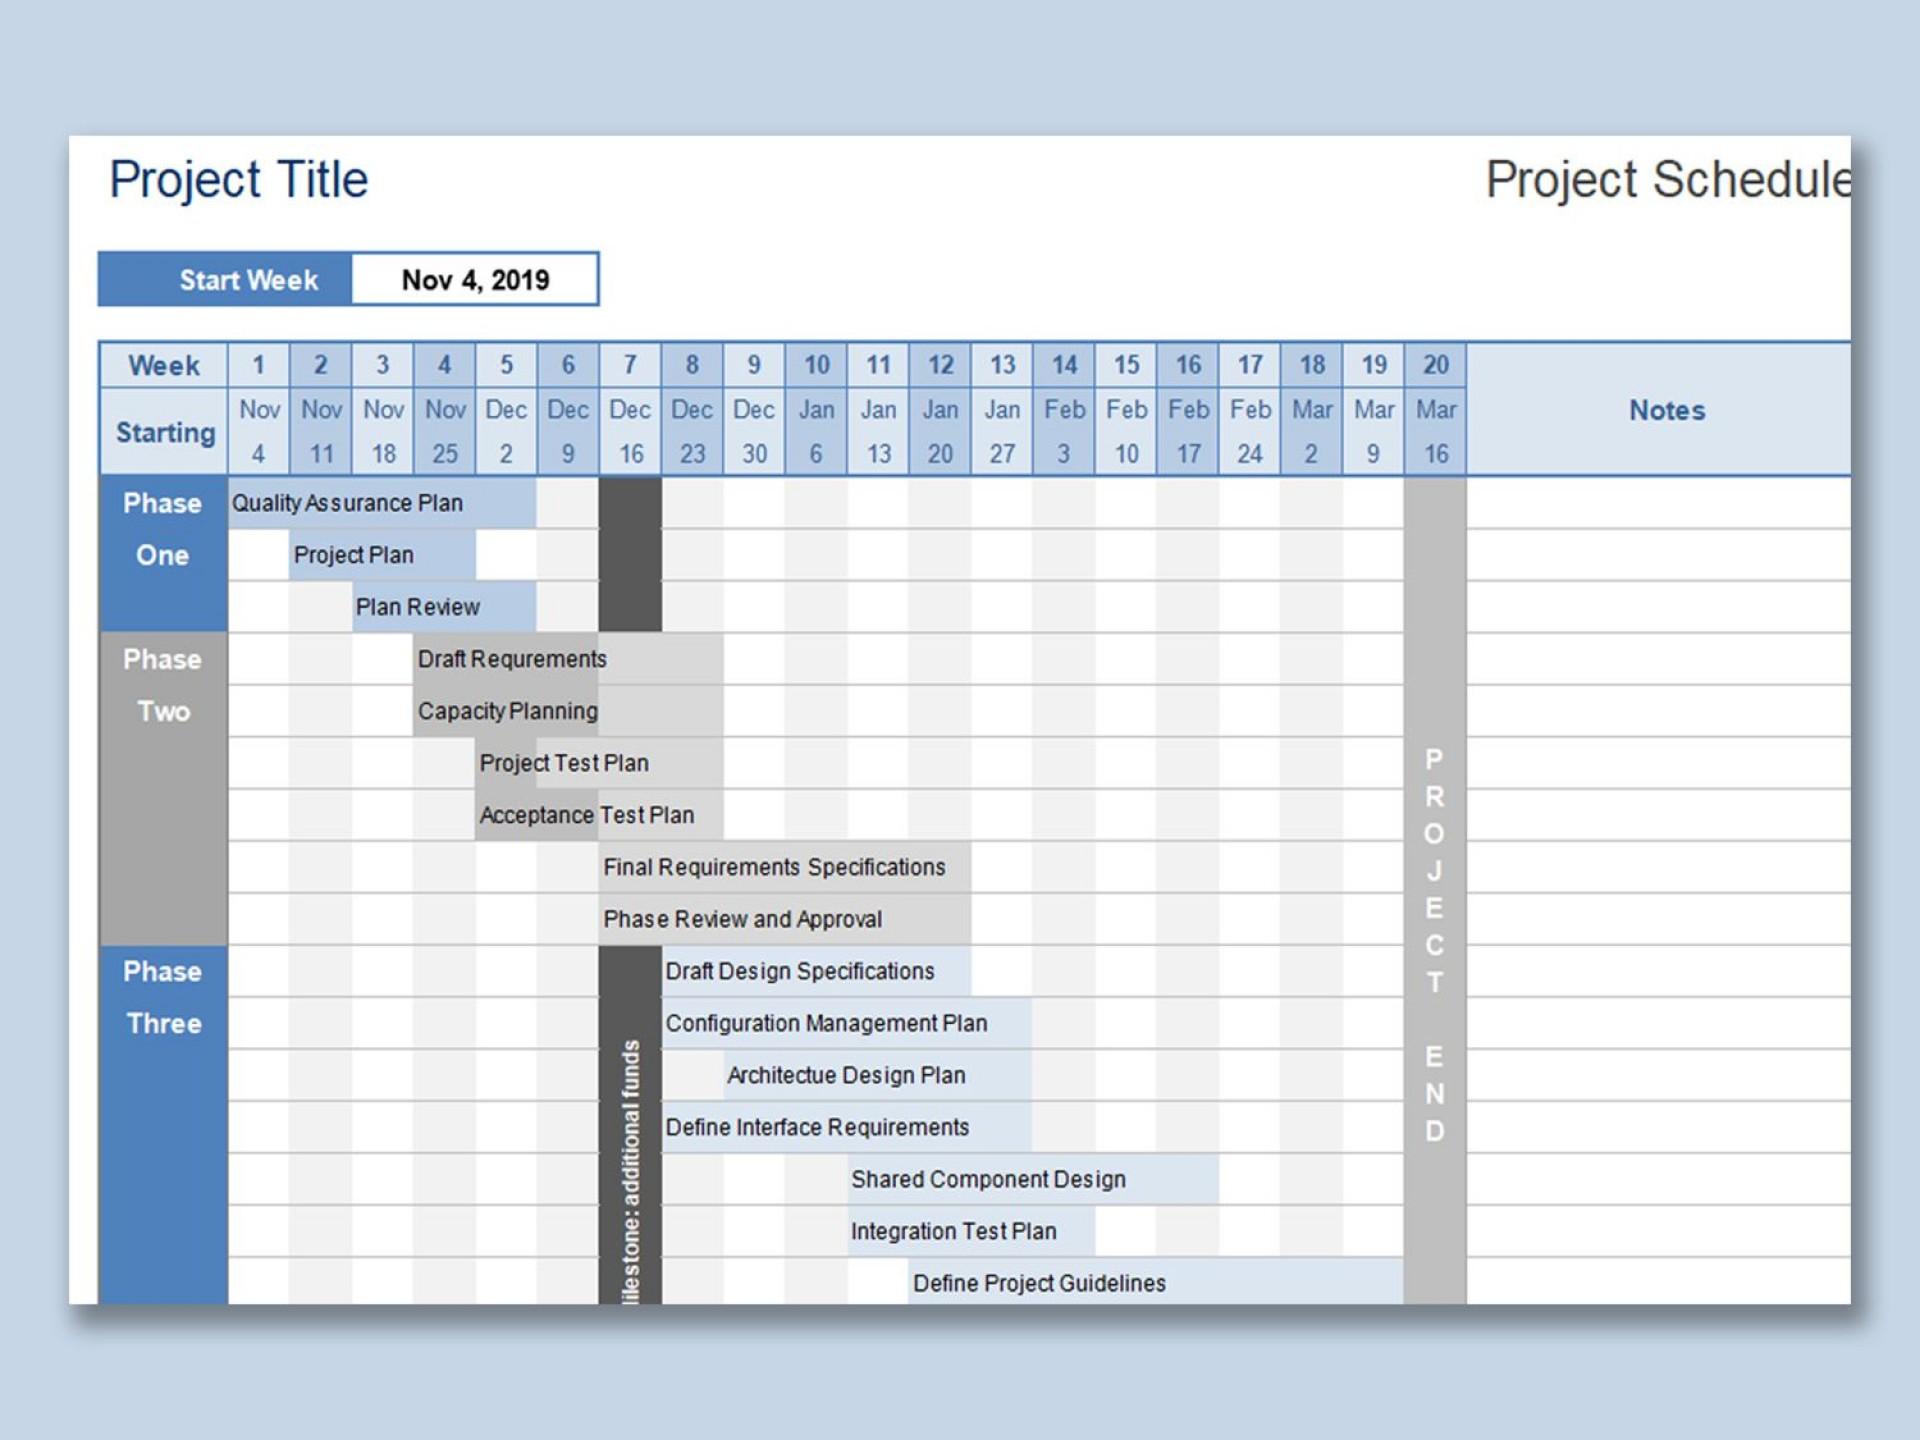 002 Impressive Project Management Form Free Download Image  Dashboard Excel Template Plan1920